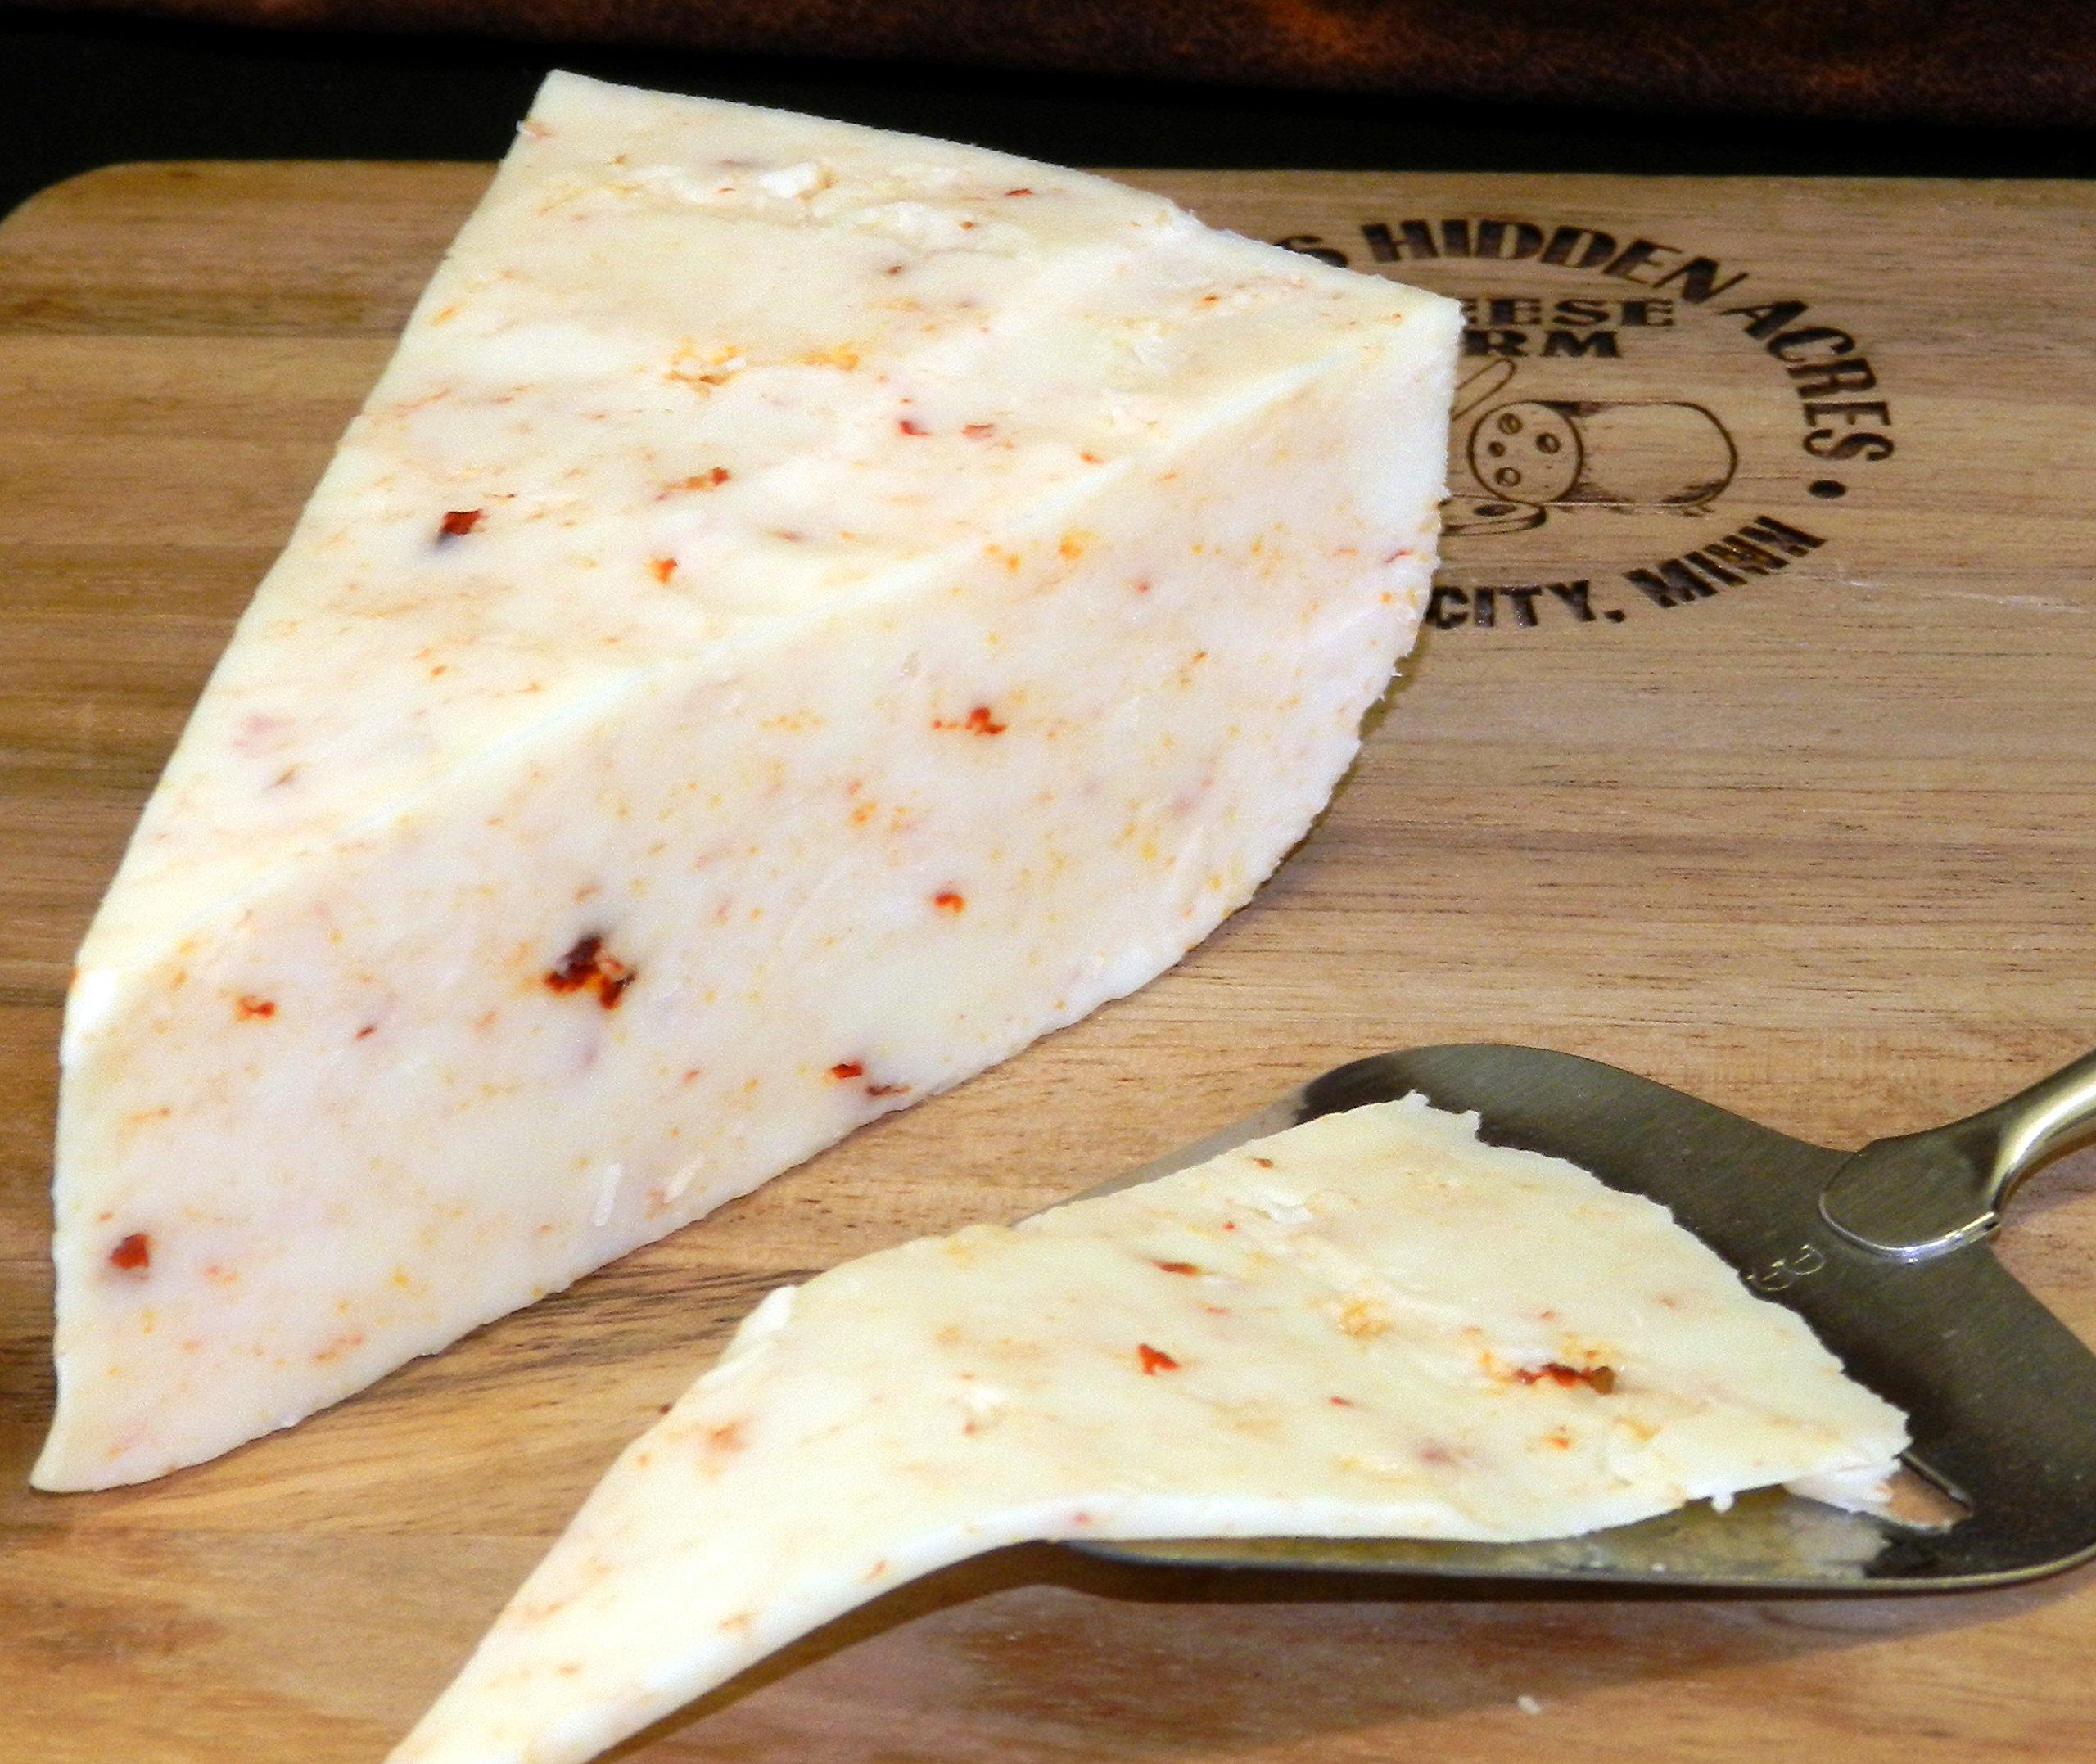 Chipotle Pepper Gouda Cheese (2-8 oz Wedges)